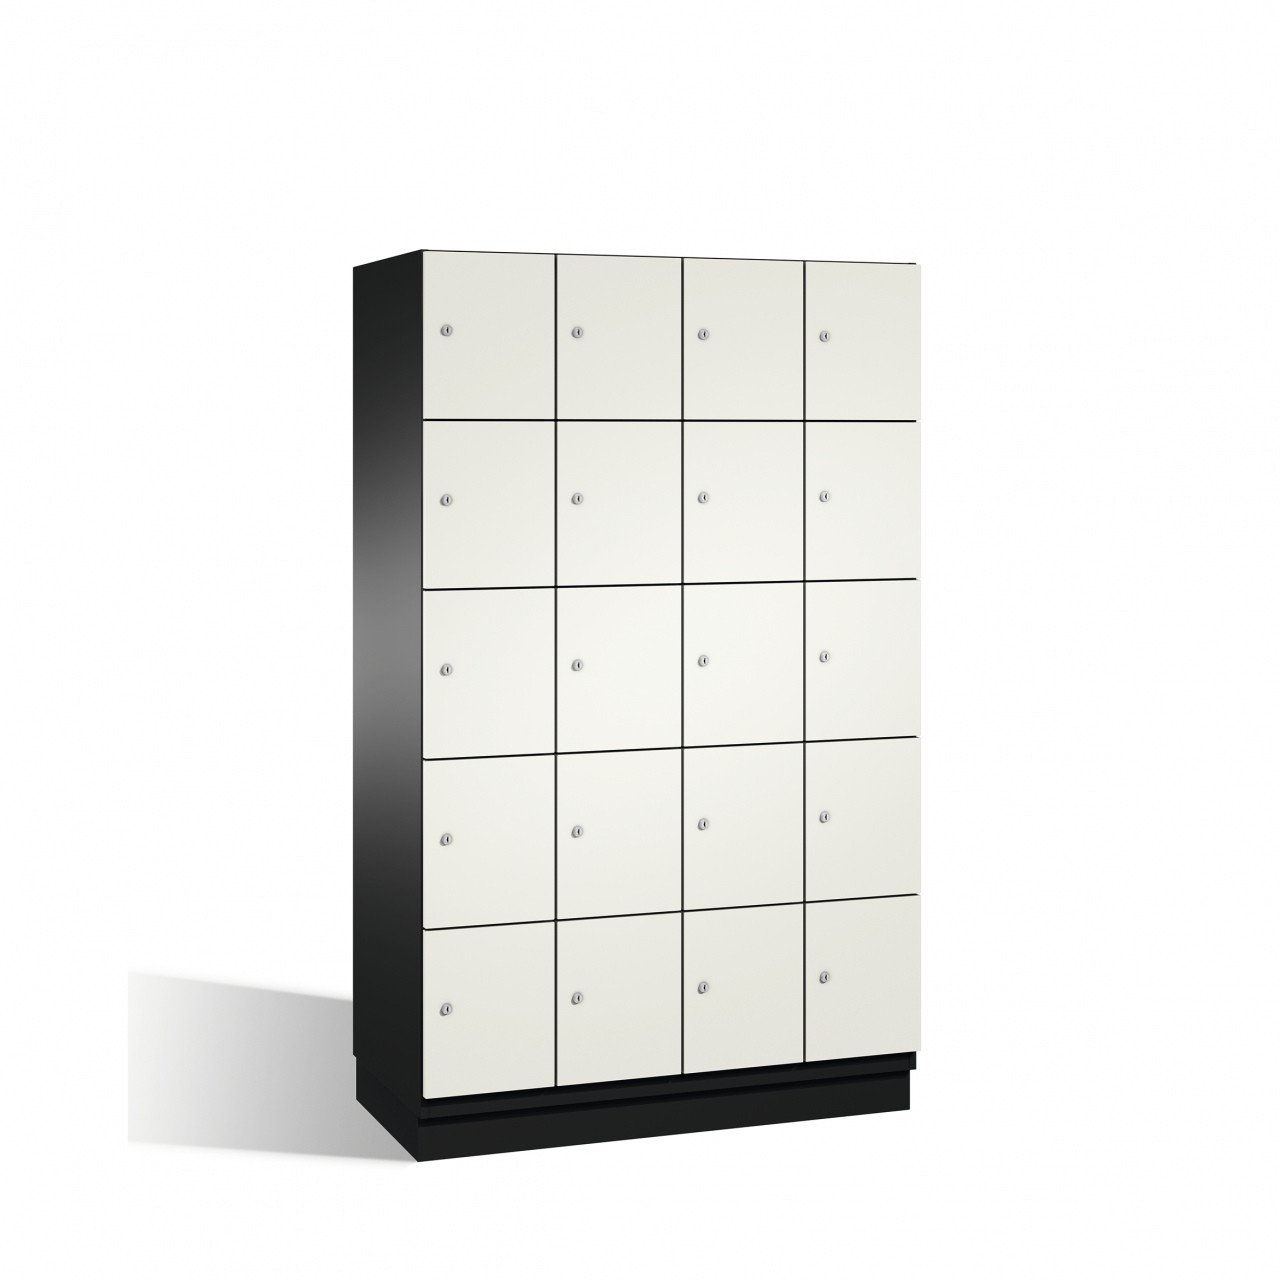 Lockers for Bedroom Storage Inspirational Locker Dresser — Procura Home Blog